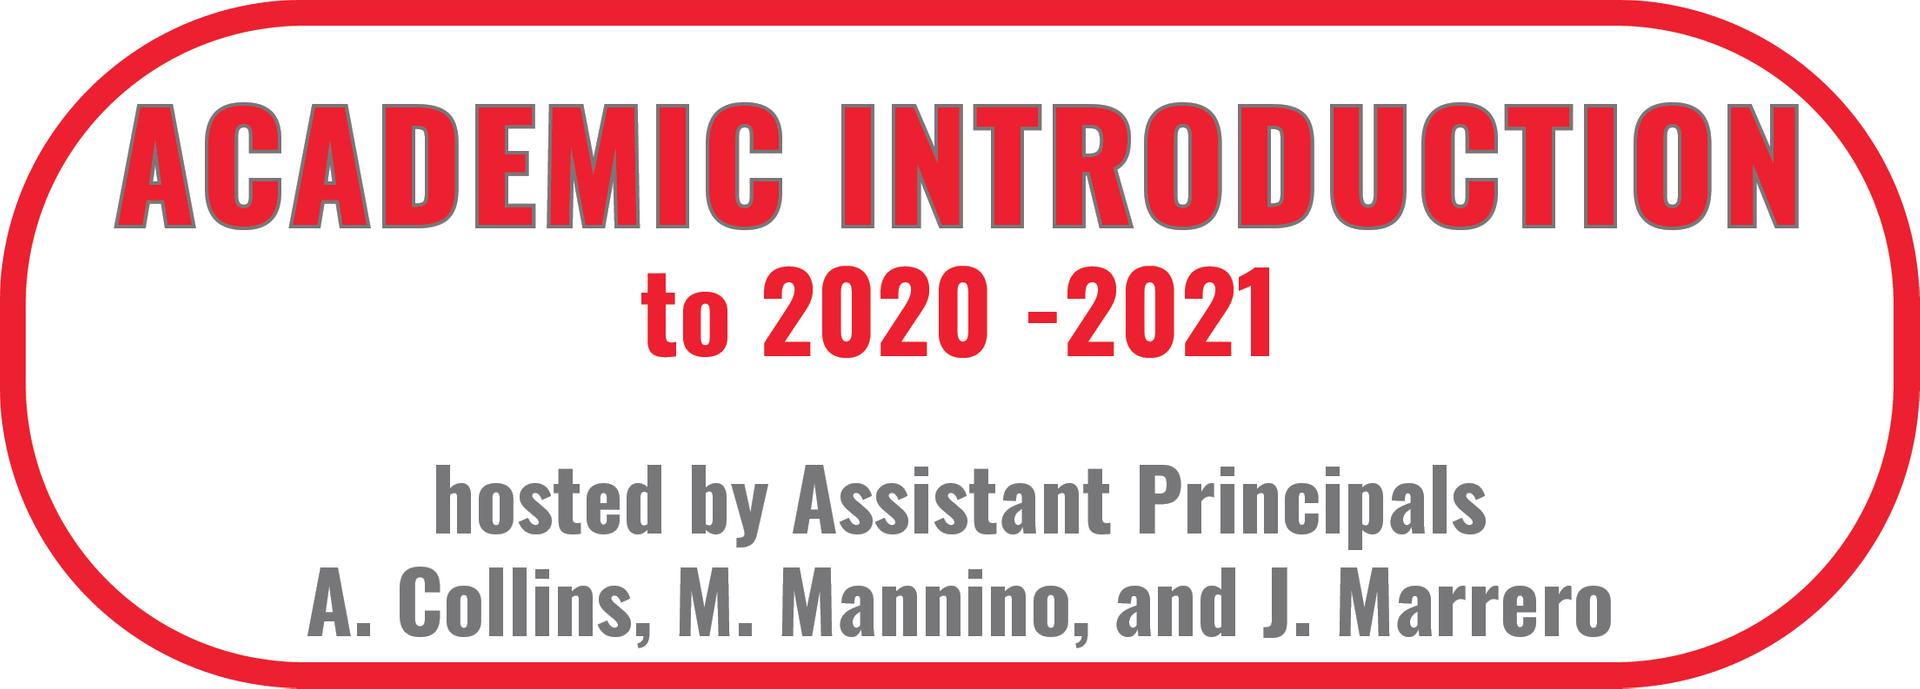 Academic Introduction Main Slide